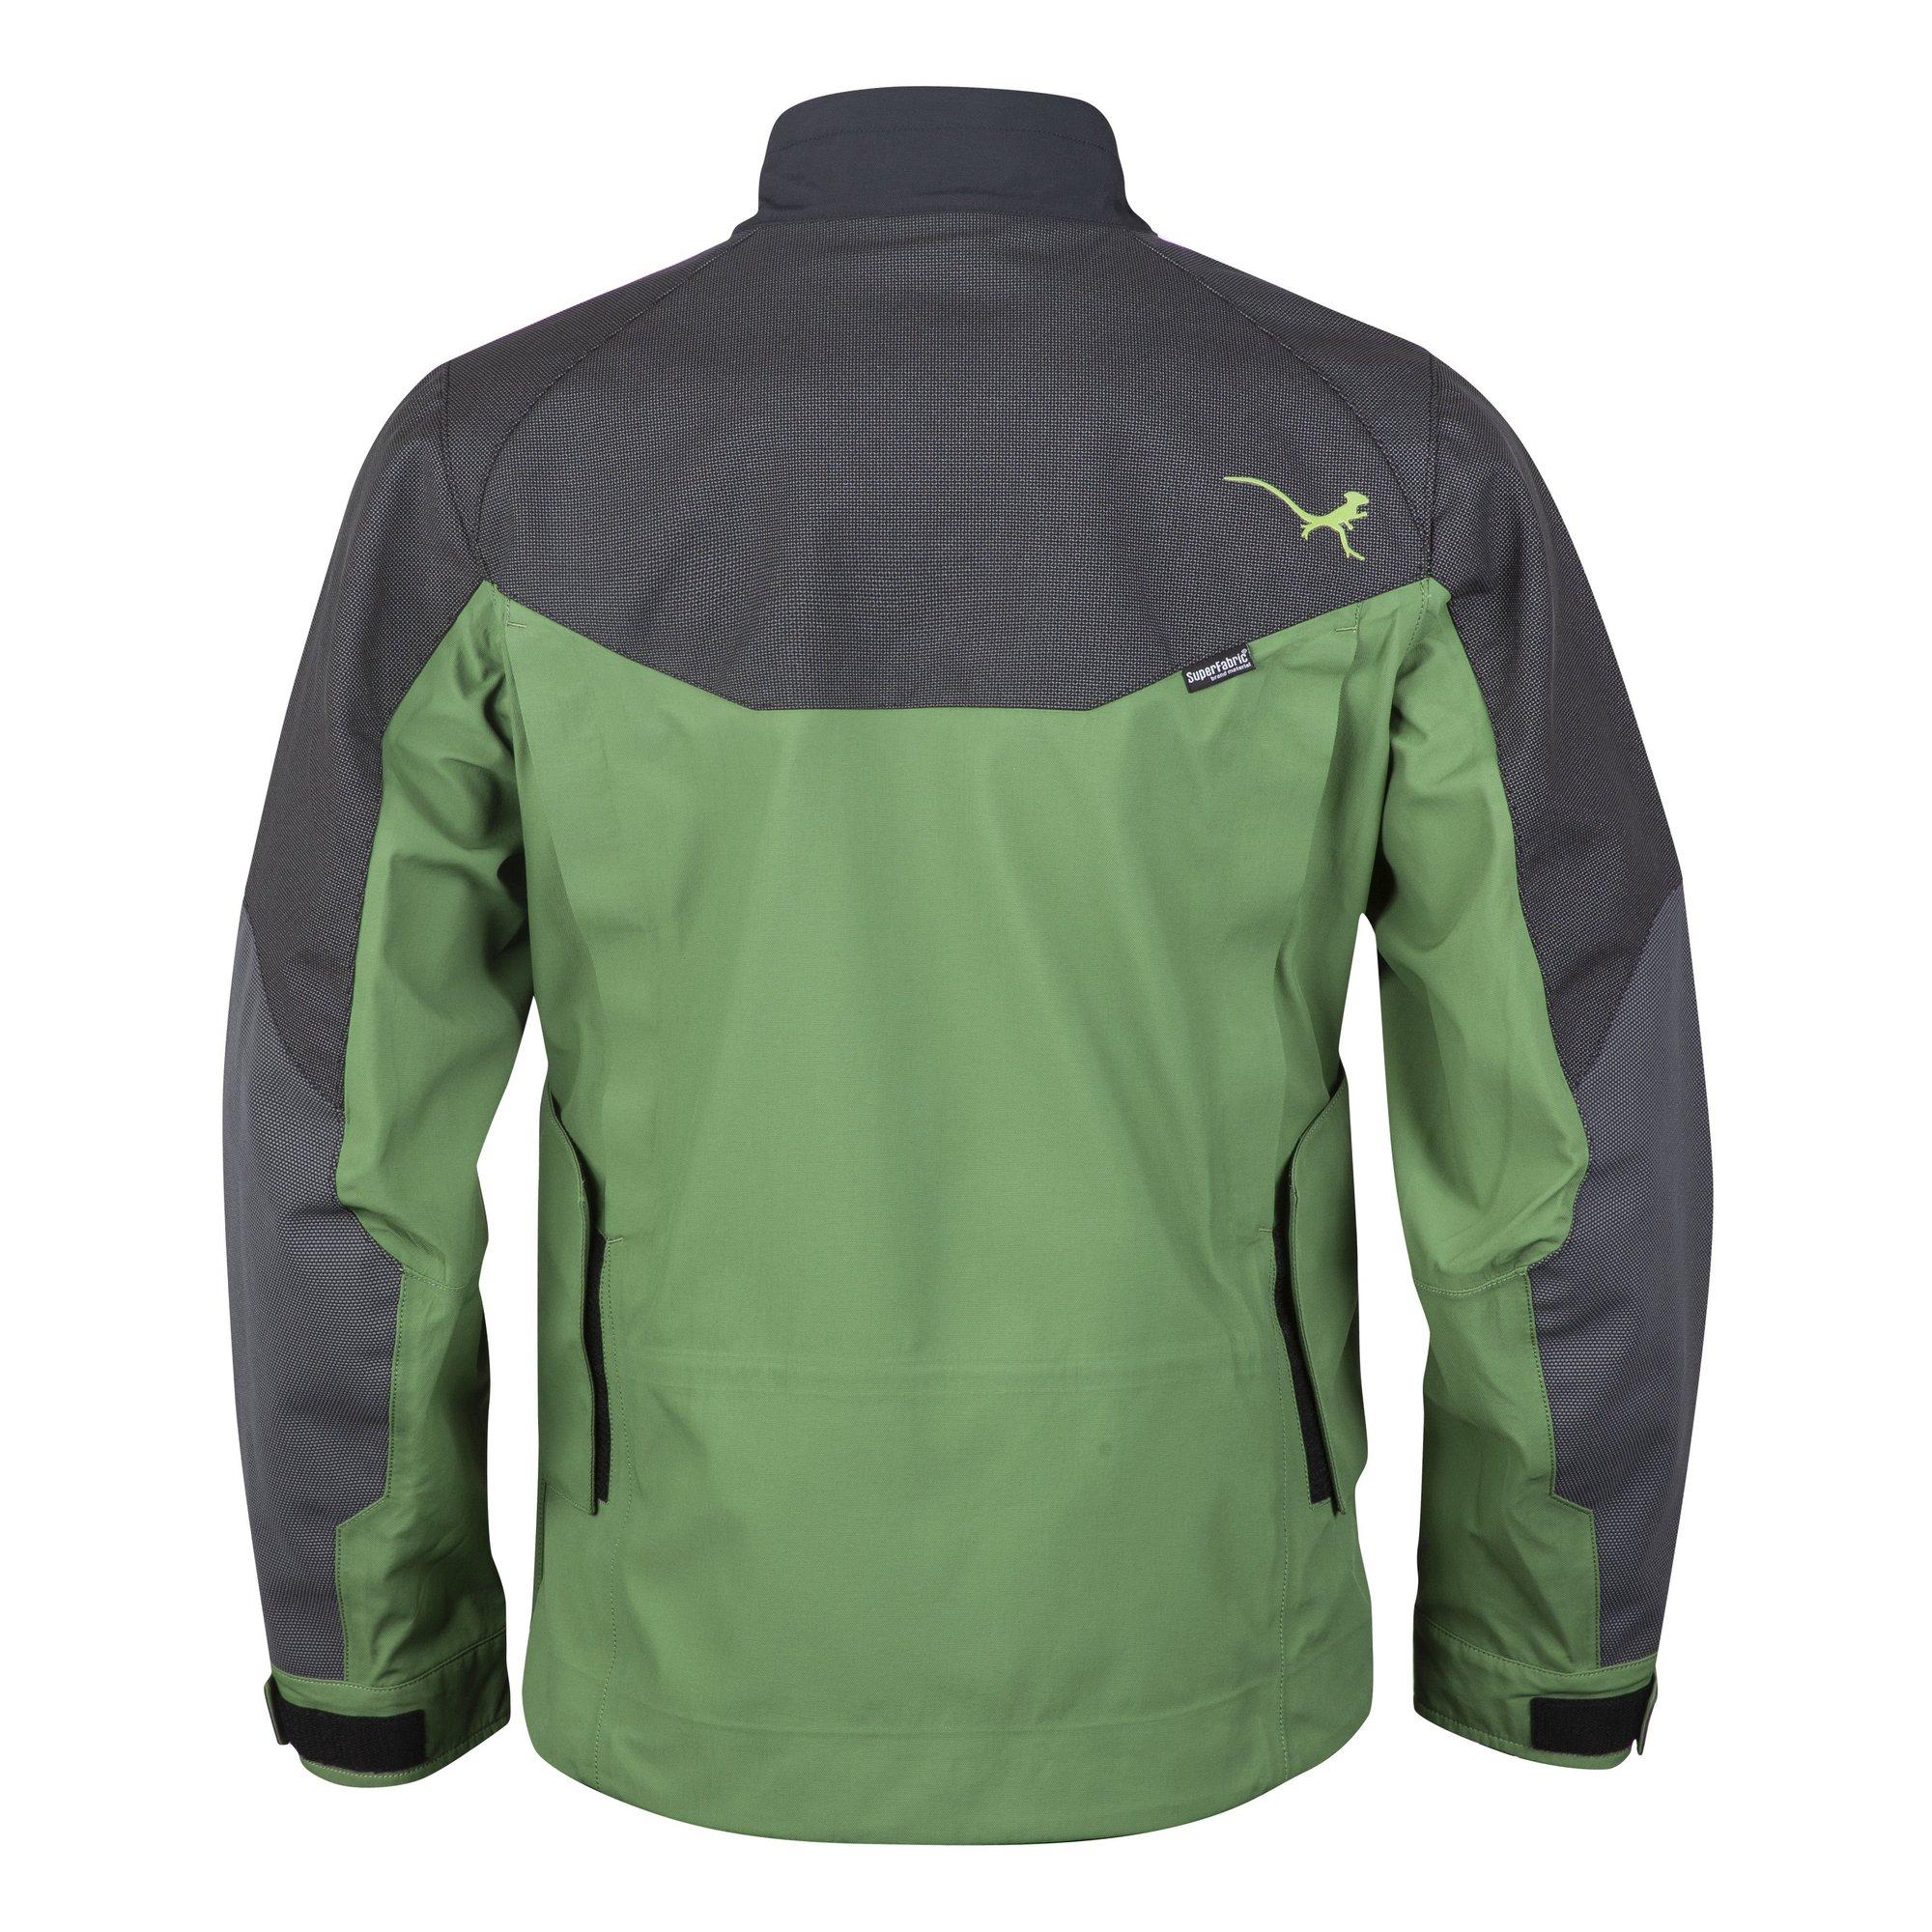 mosko-moto-apparel-s-charcoal-basilisk-jacket-11332268752957_2000x.jpg